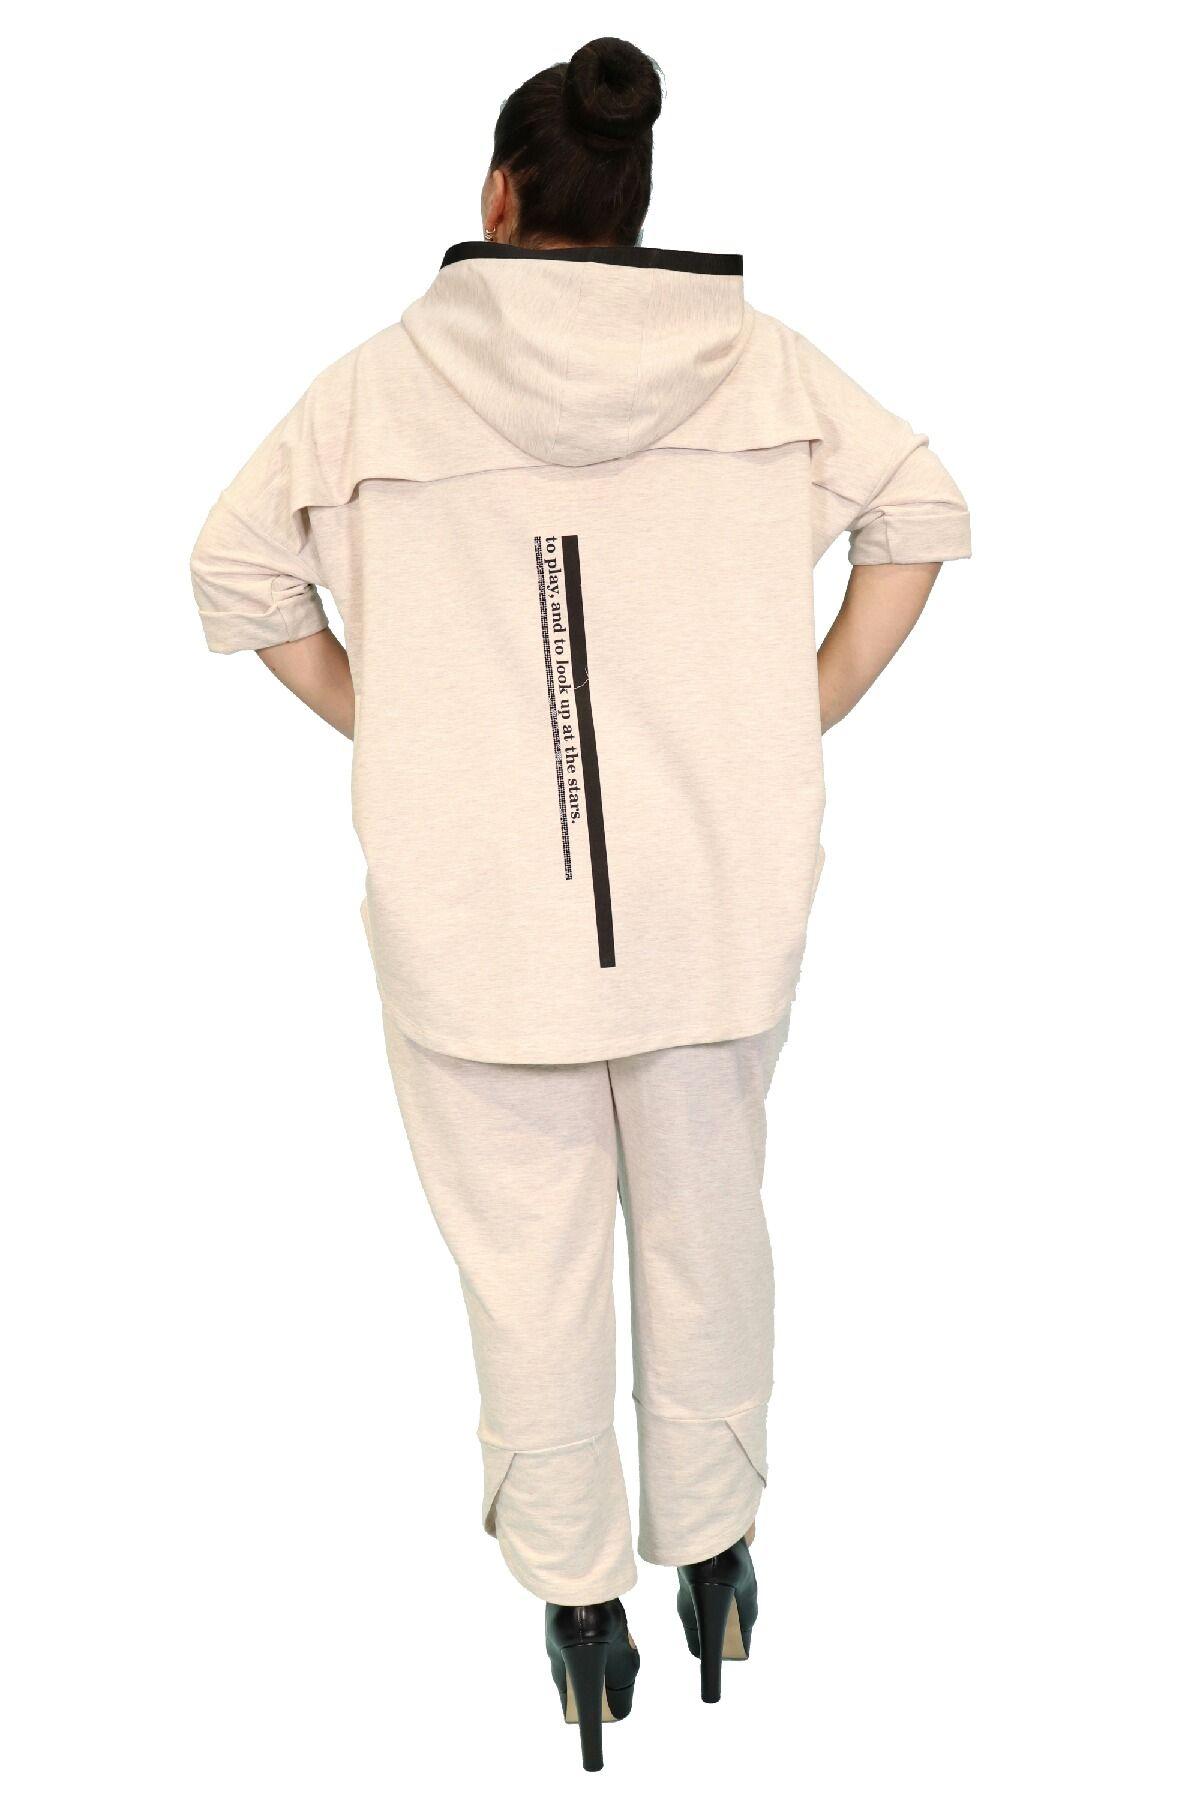 Two-Piece Suit-Ecru